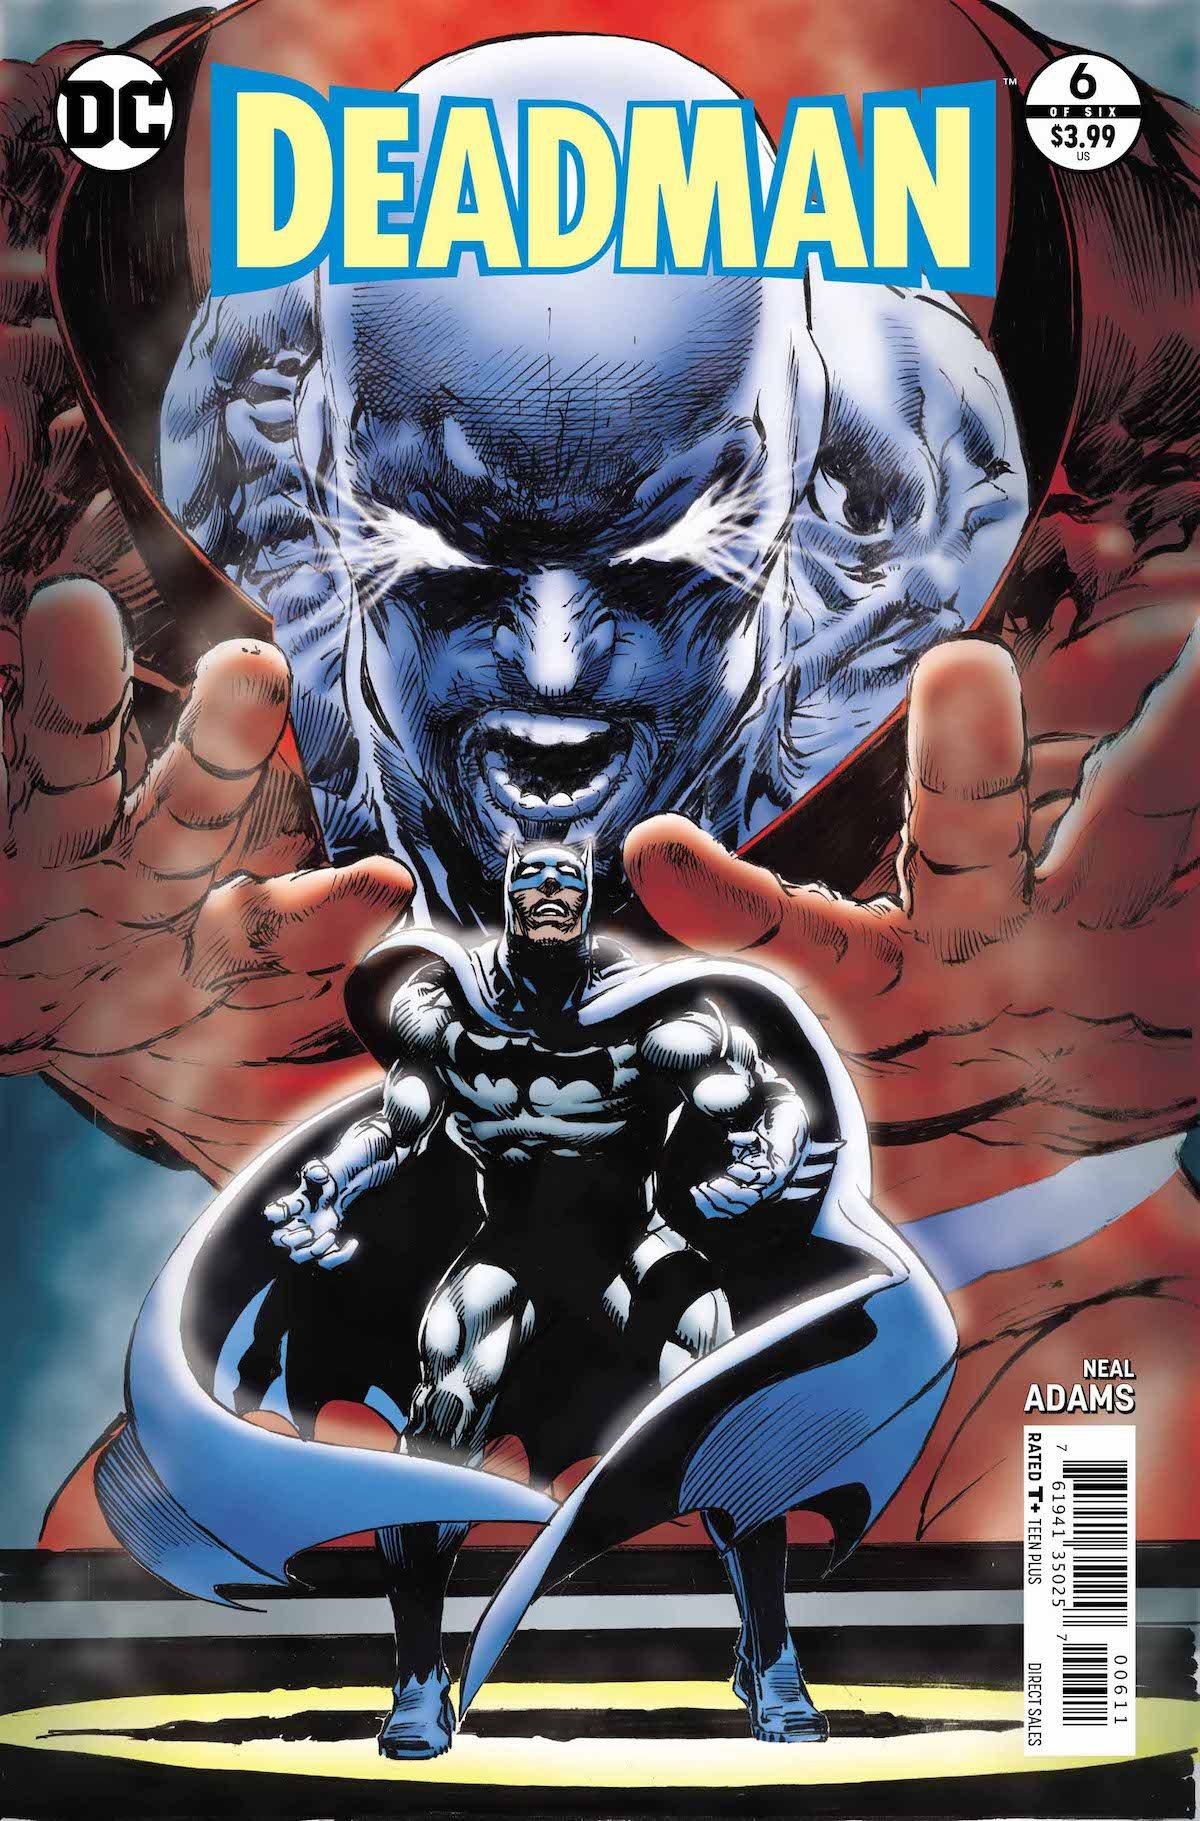 Deadman #6 cover